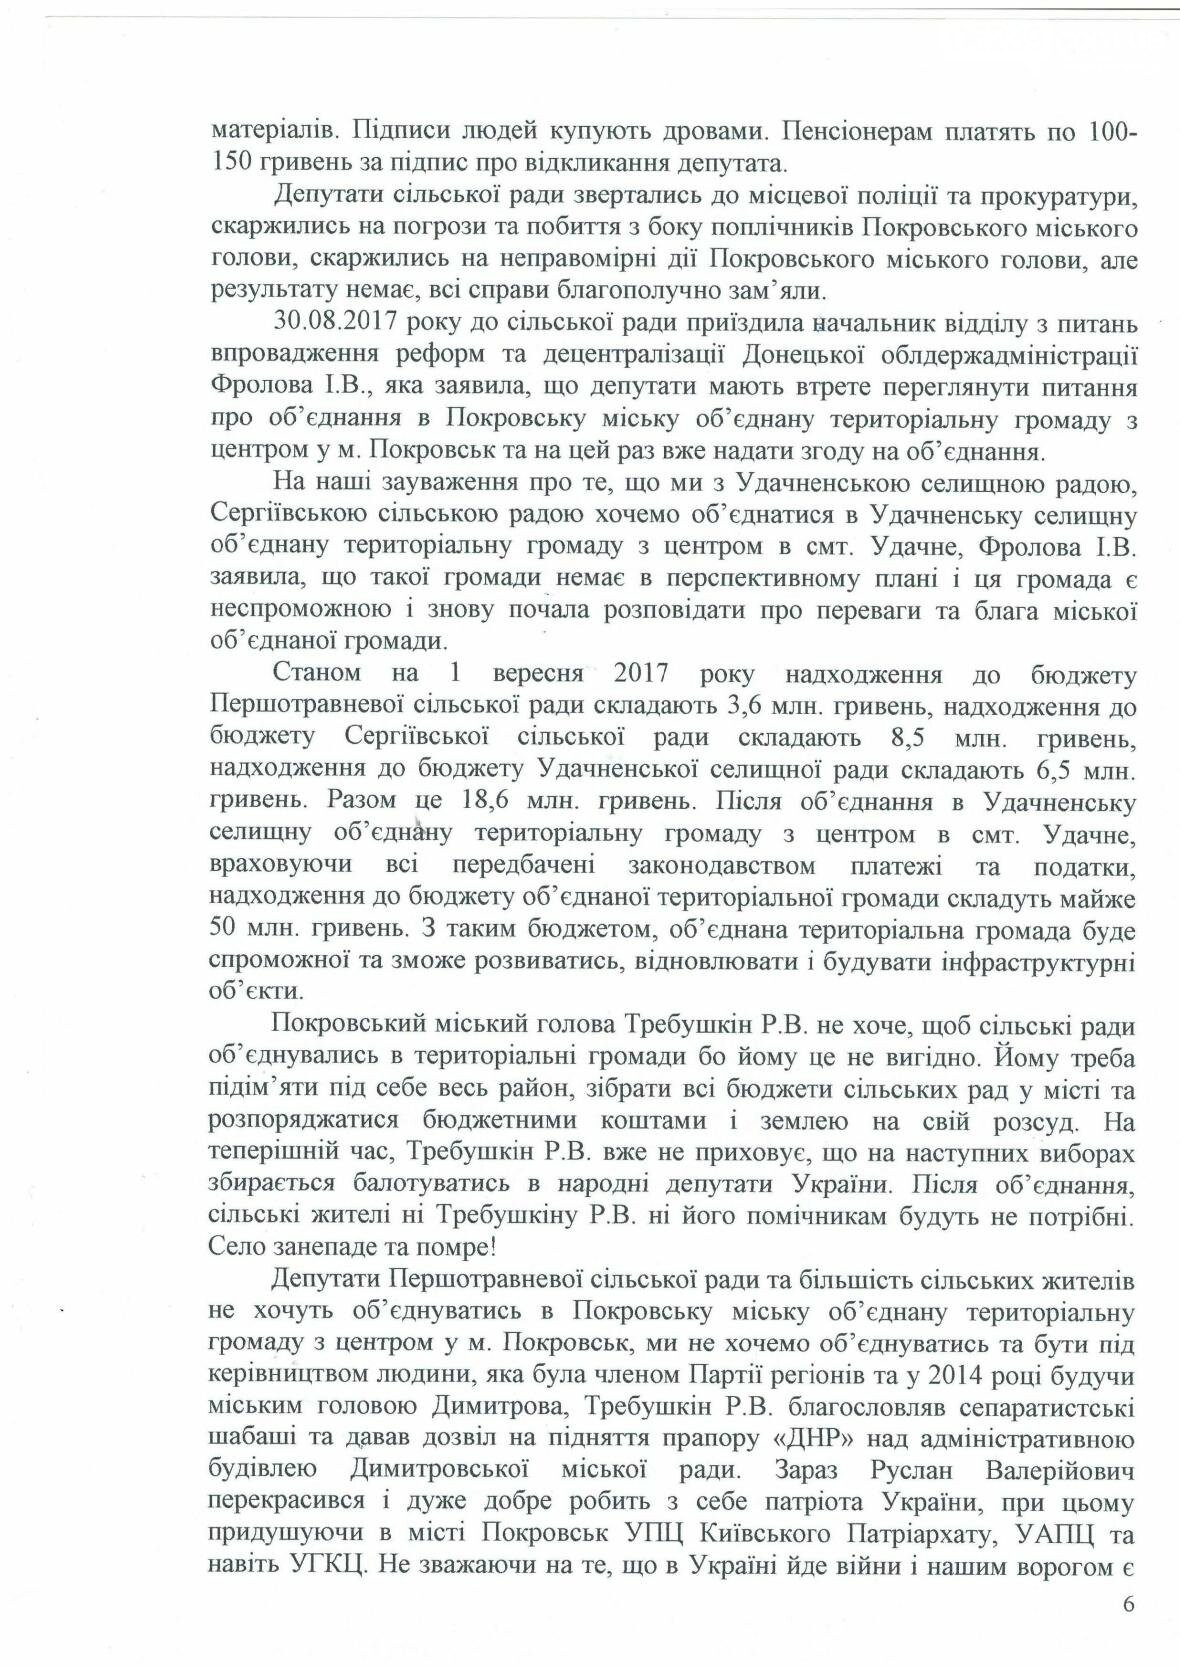 Децентрализация по-покровски: жители поселка Первое Мая просят помощи у Президента, фото-6